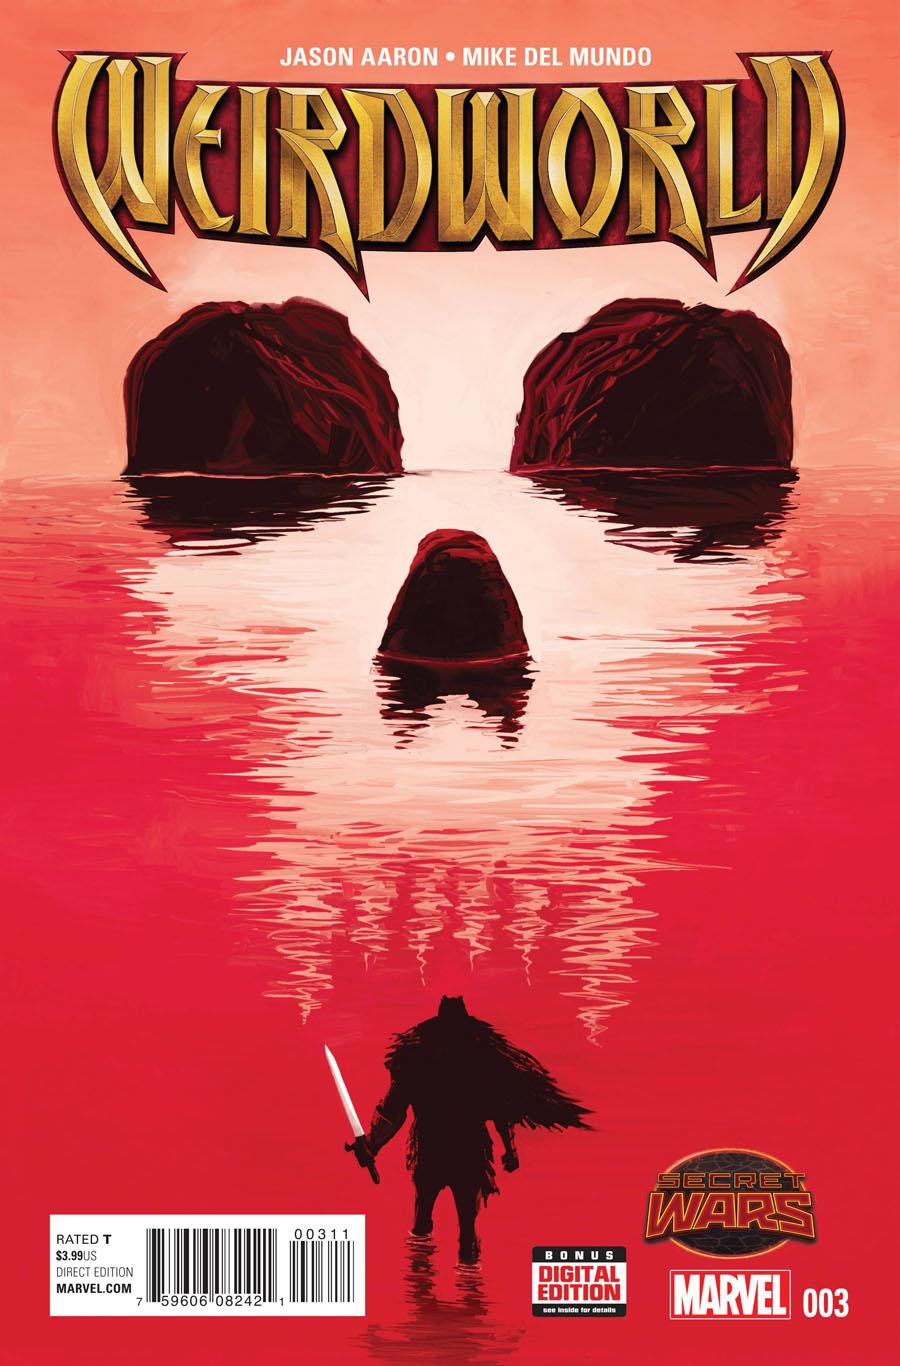 Weirdworld #3 Cover A Regular Mike Del Mundo Cover (Secret Wars Warzones Tie-In)